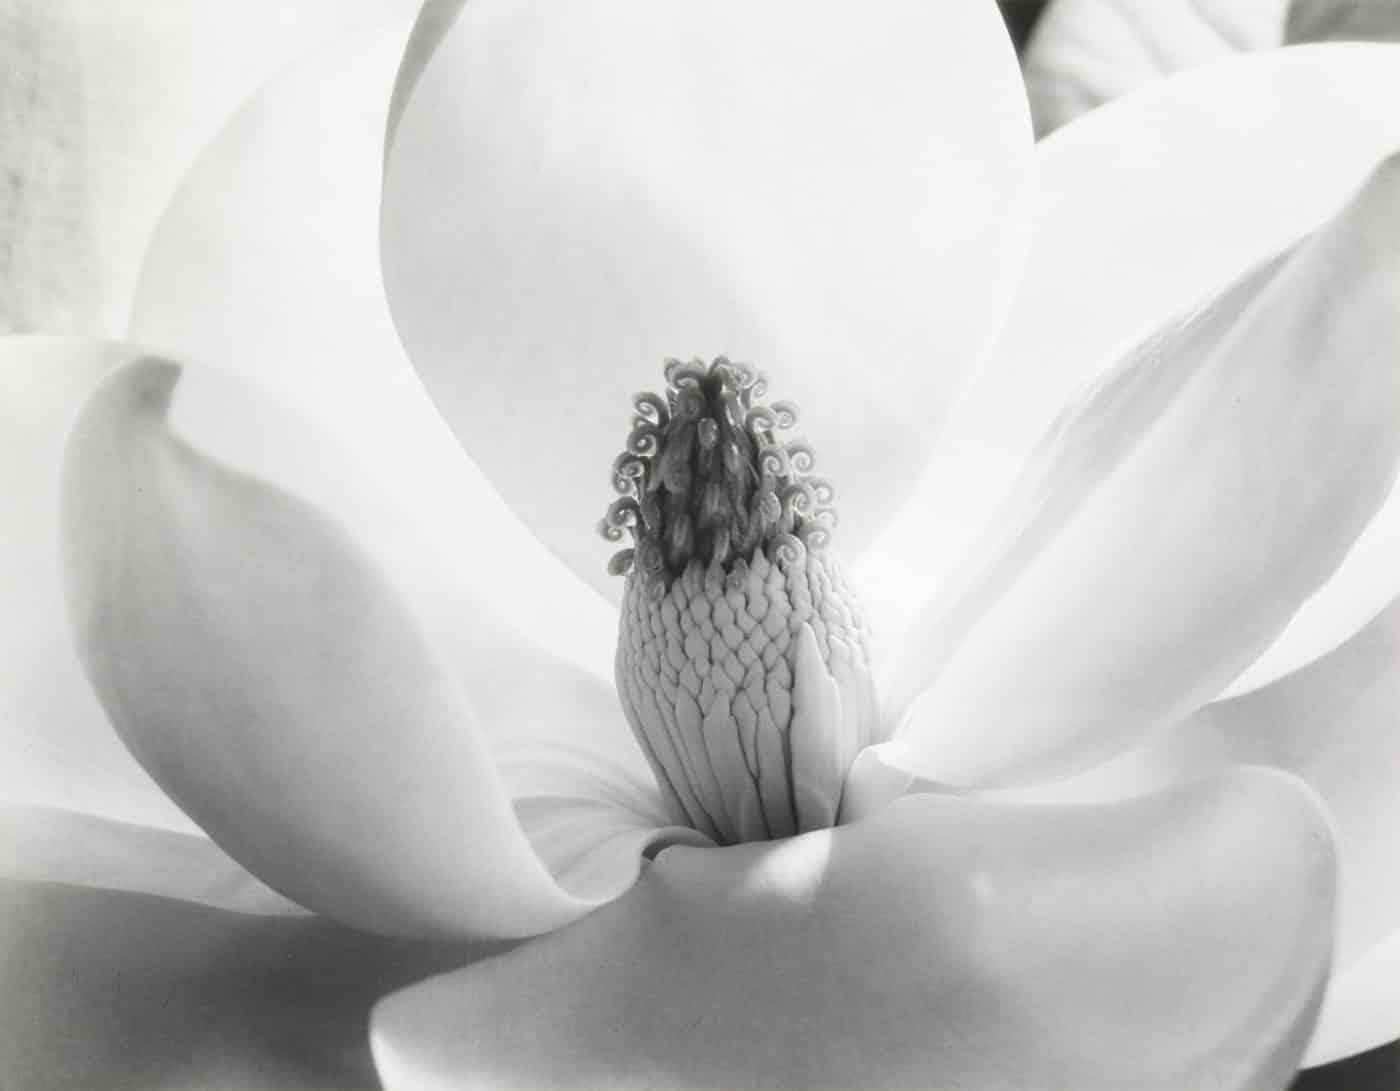 Magnolia Blossom, 1975, by Imogen Cunningham